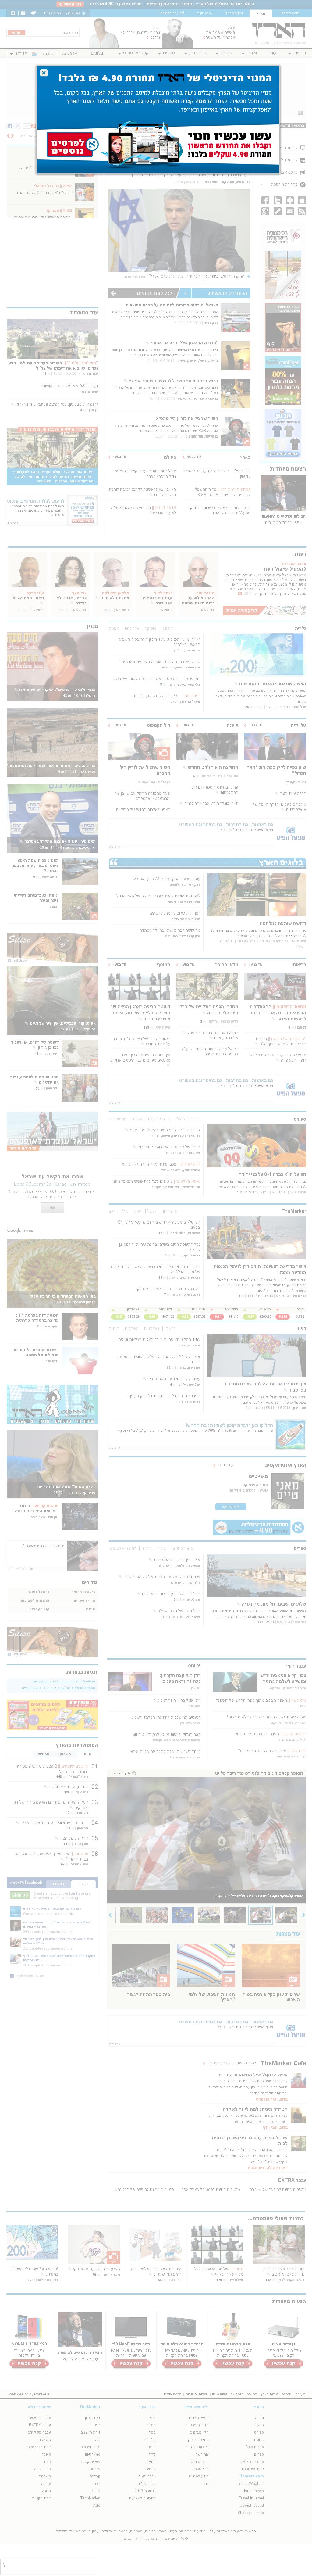 Haaretz at Monday May 6, 2013, 7:10 p.m. UTC